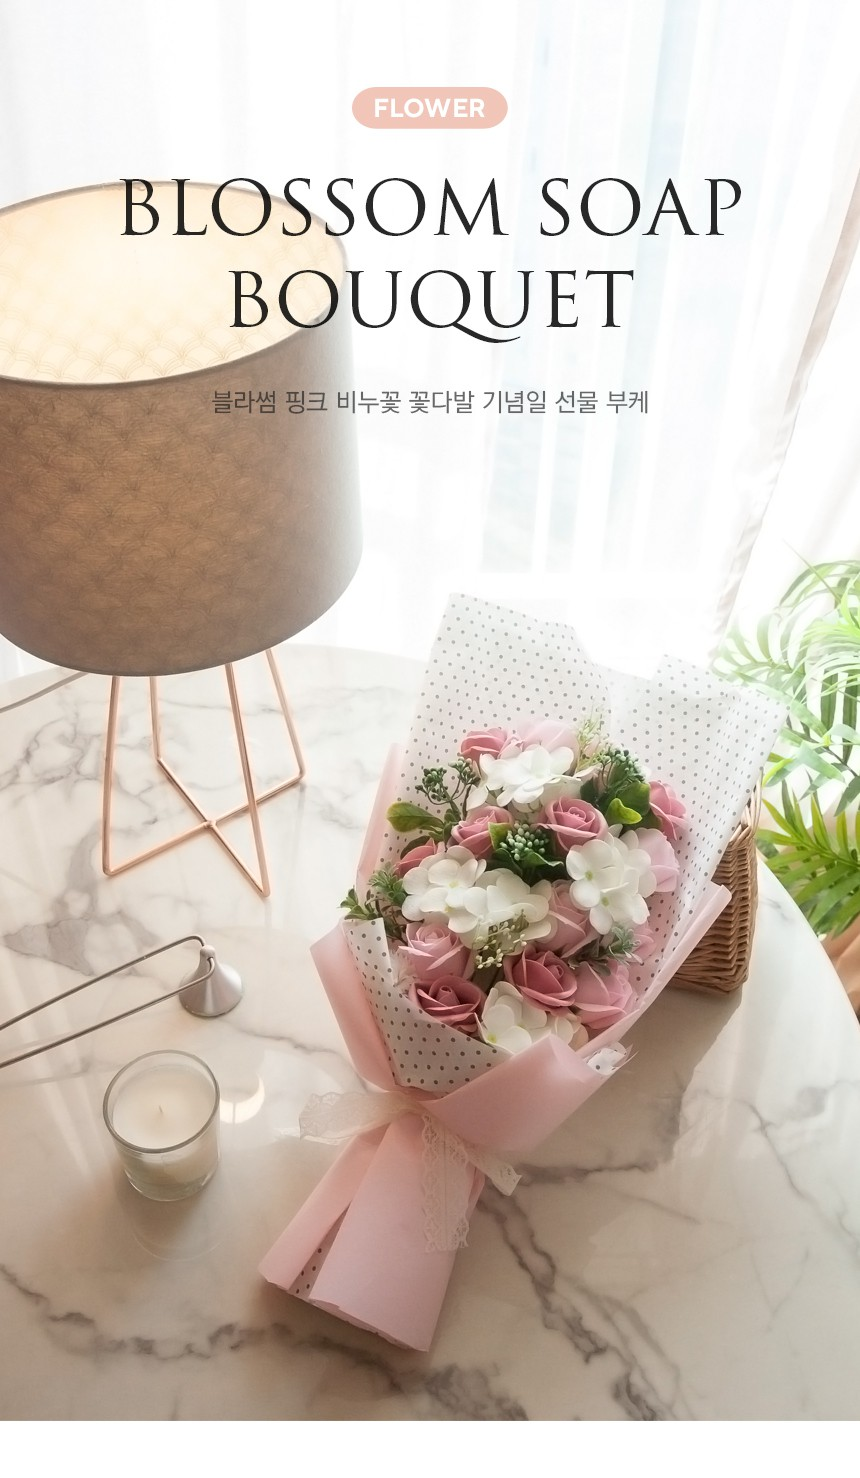 BLOSSOM_PINK_SOAP_FLOWER_BOUQUET_01.jpg